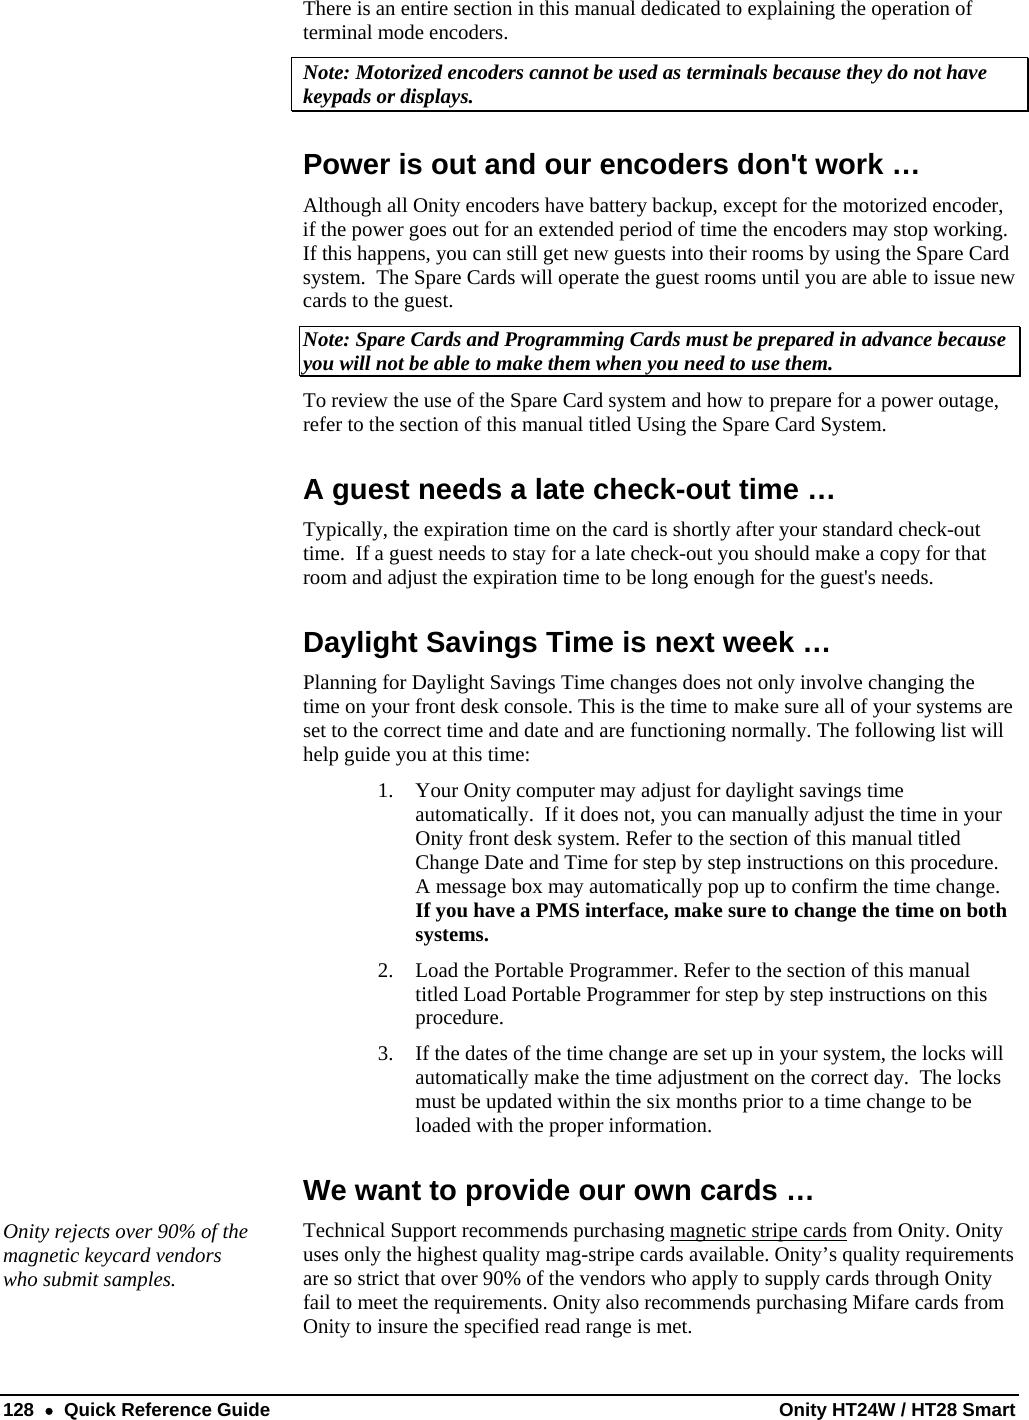 onity card ht22 manual